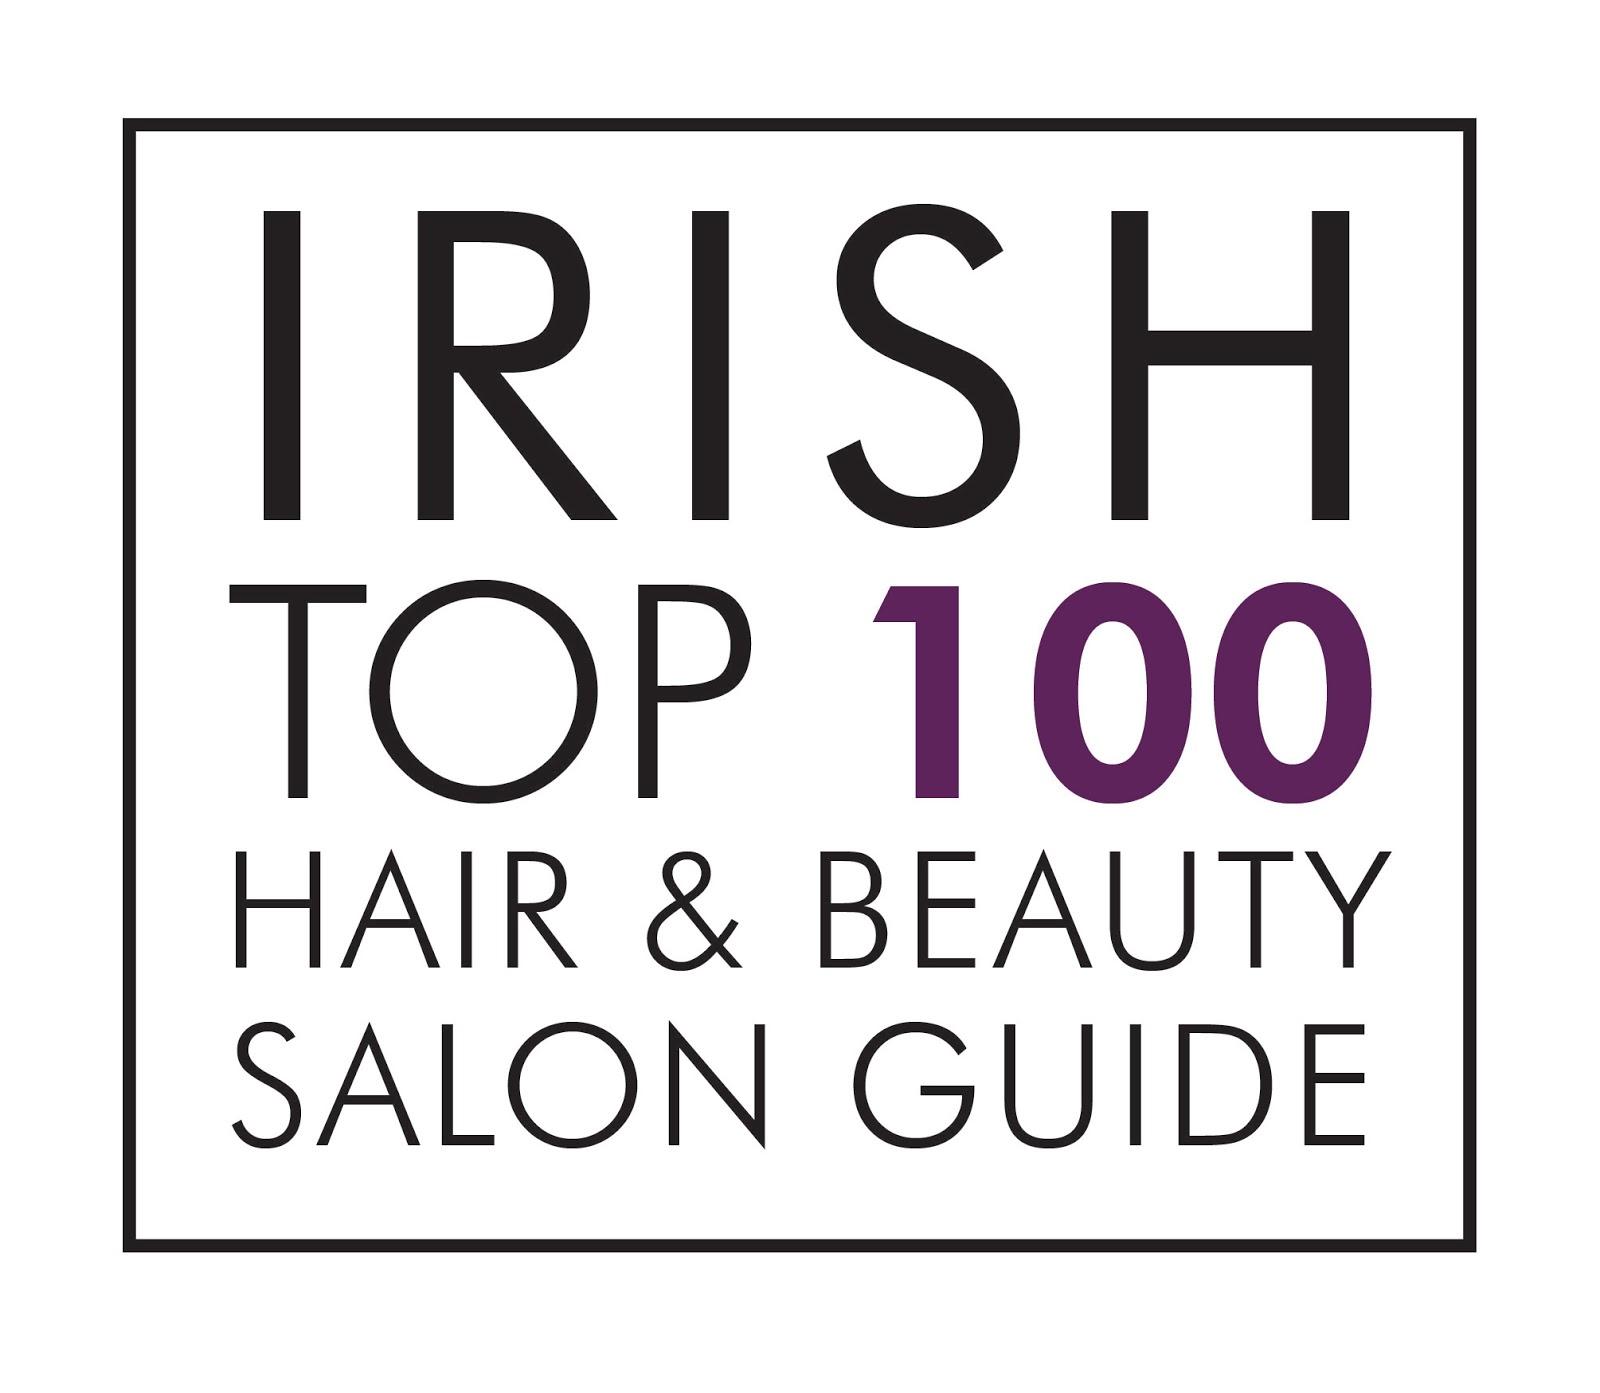 Beauty salon essex junction